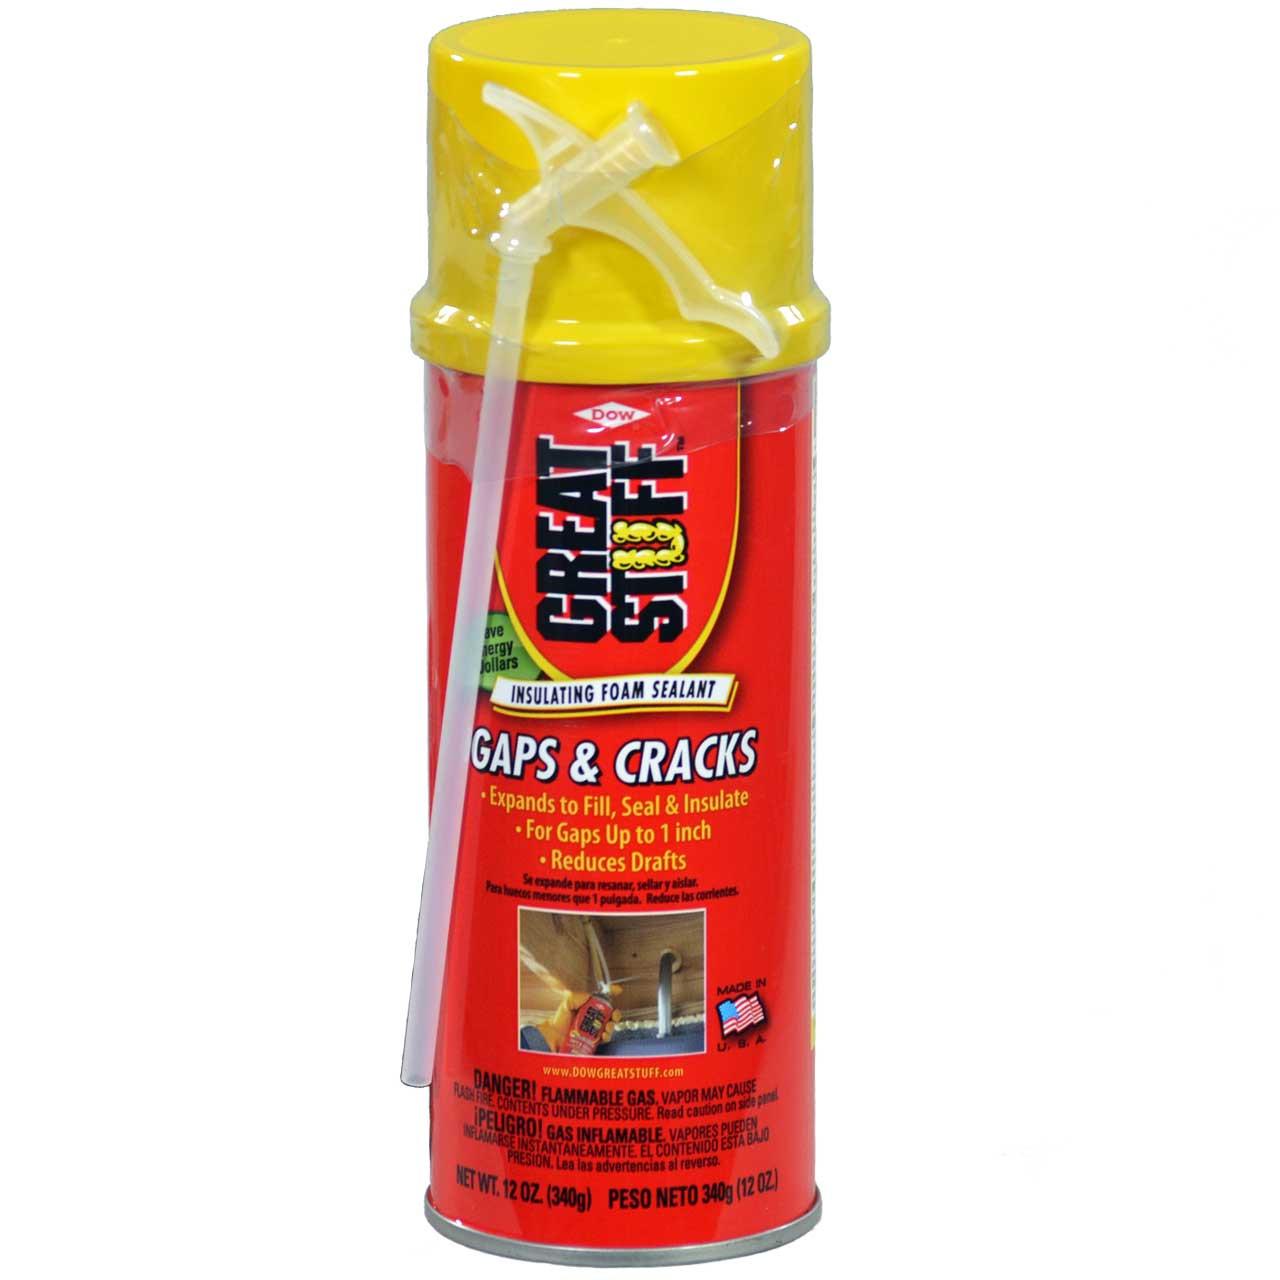 Dow Great Stuff Gaps & Cracks Insulating Foam Sealant, 12 oz Can